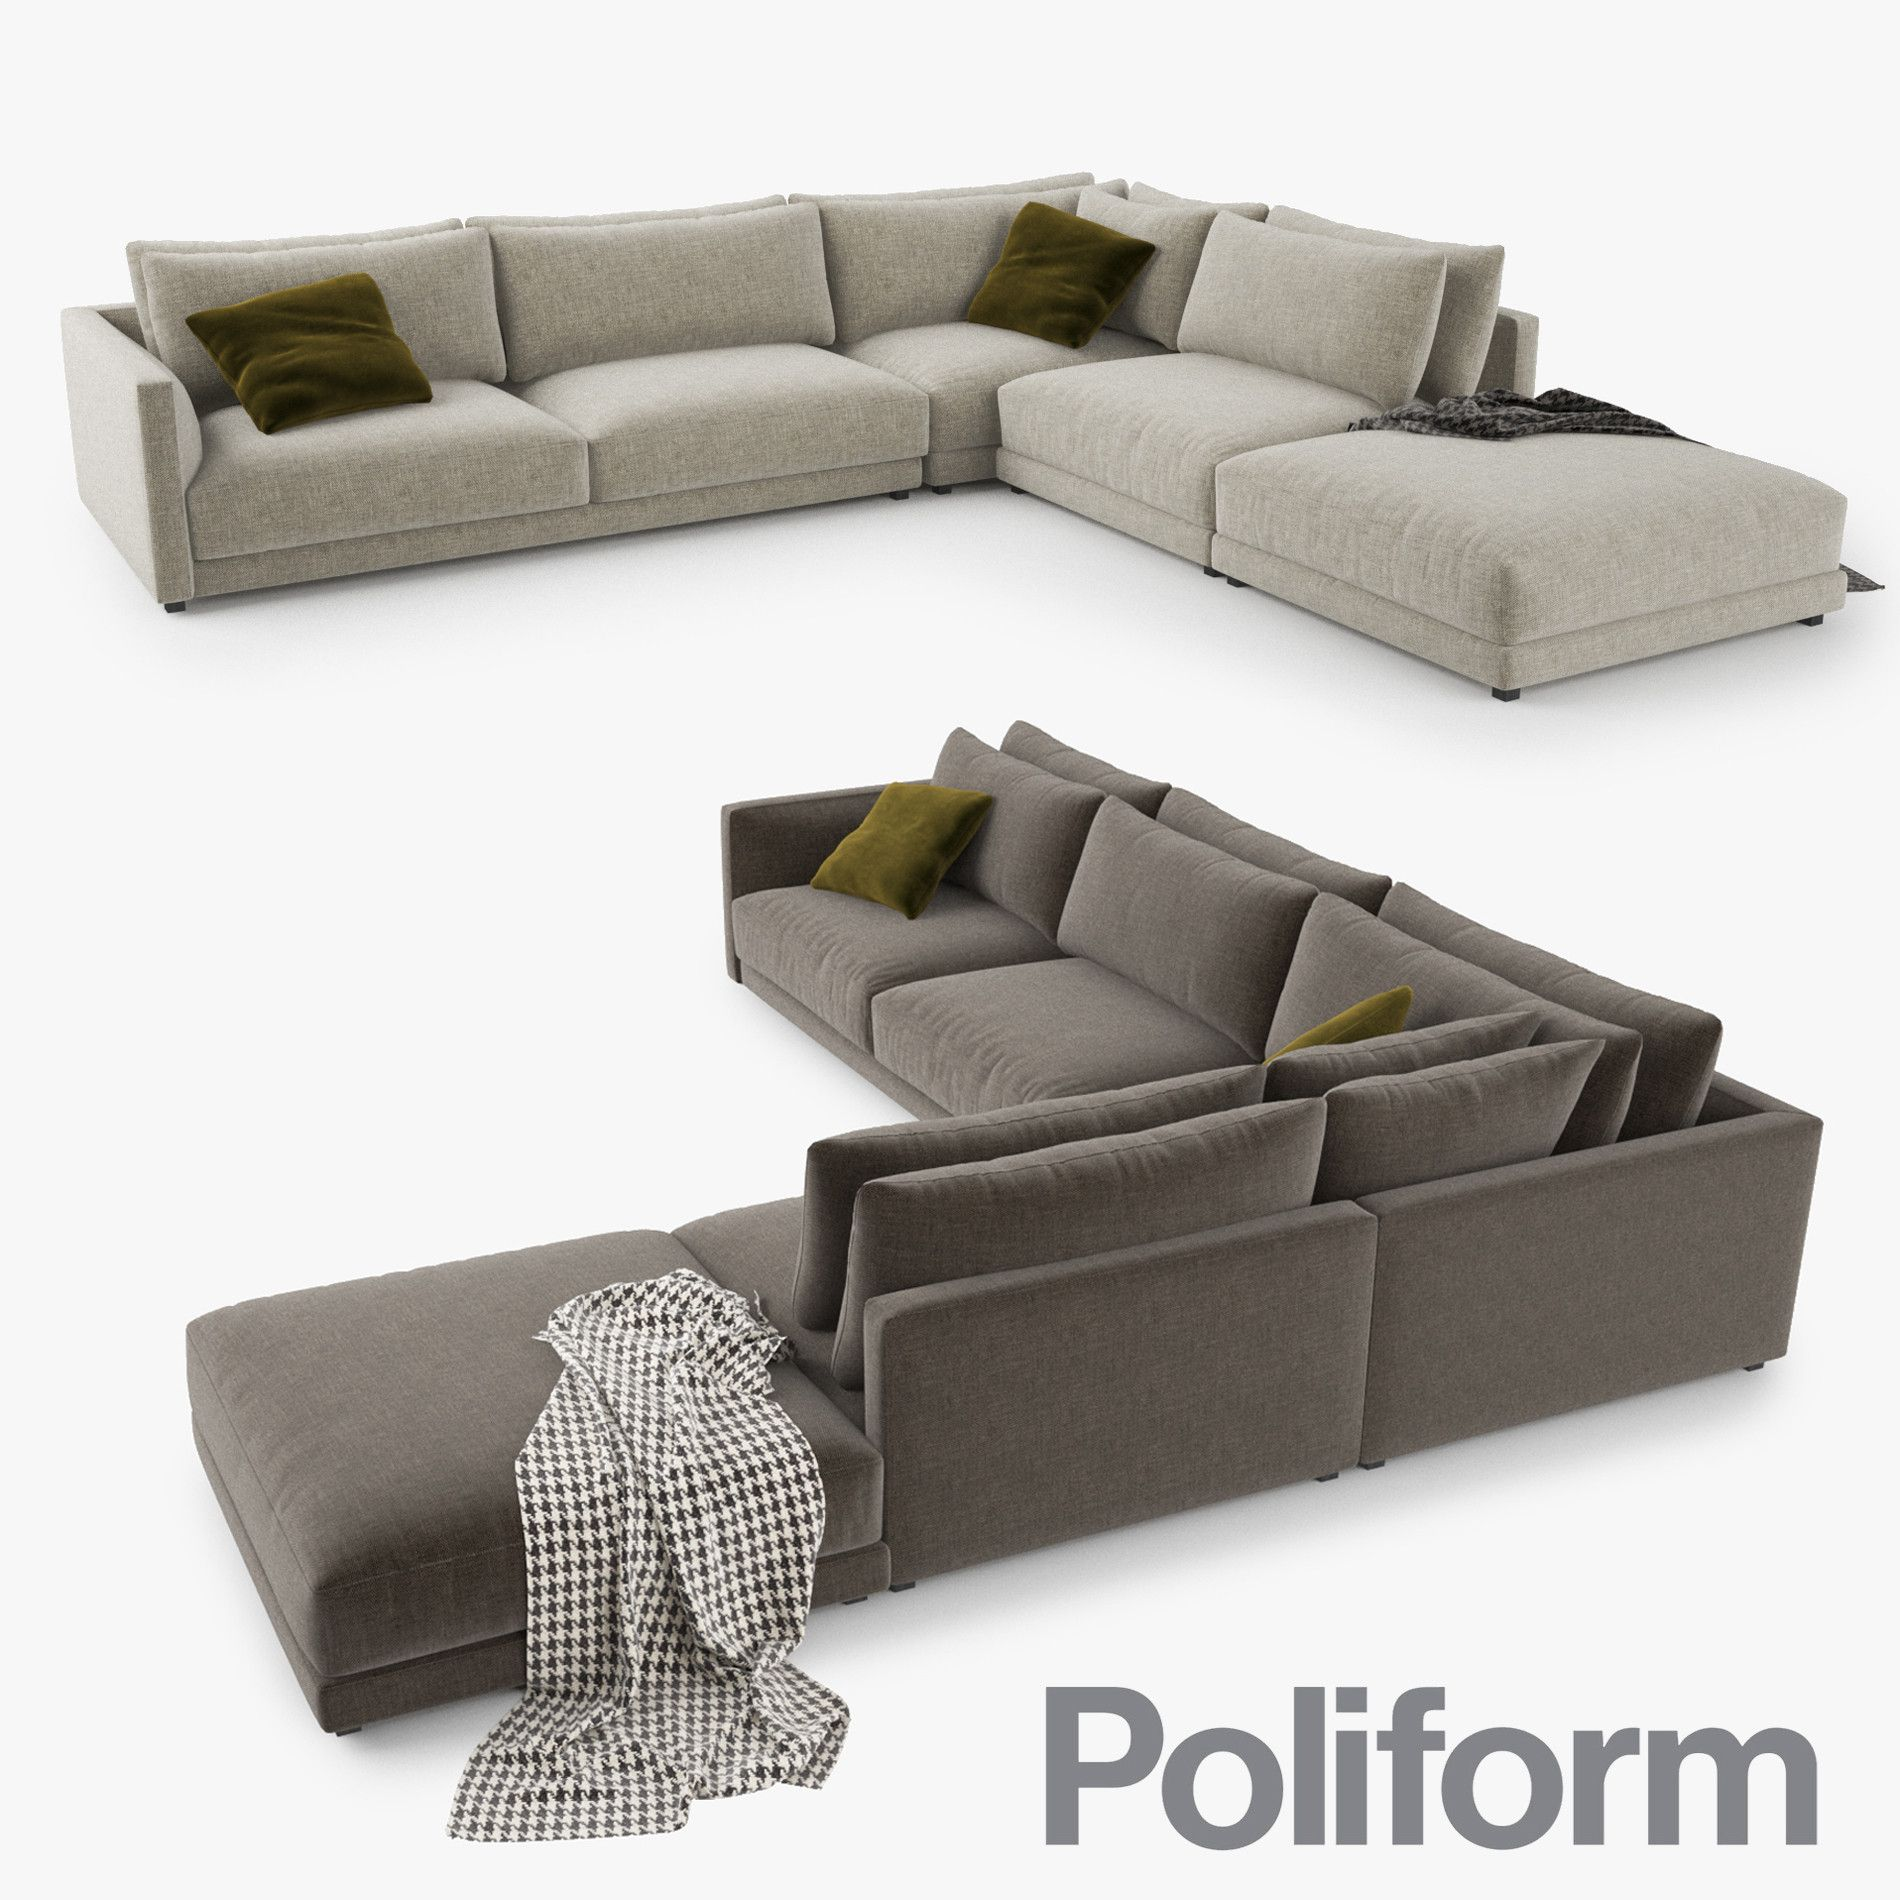 3d 3ds Poliform Bristol Sofa 3d Model Modern Sofa Living Room Poliform Sofa Design